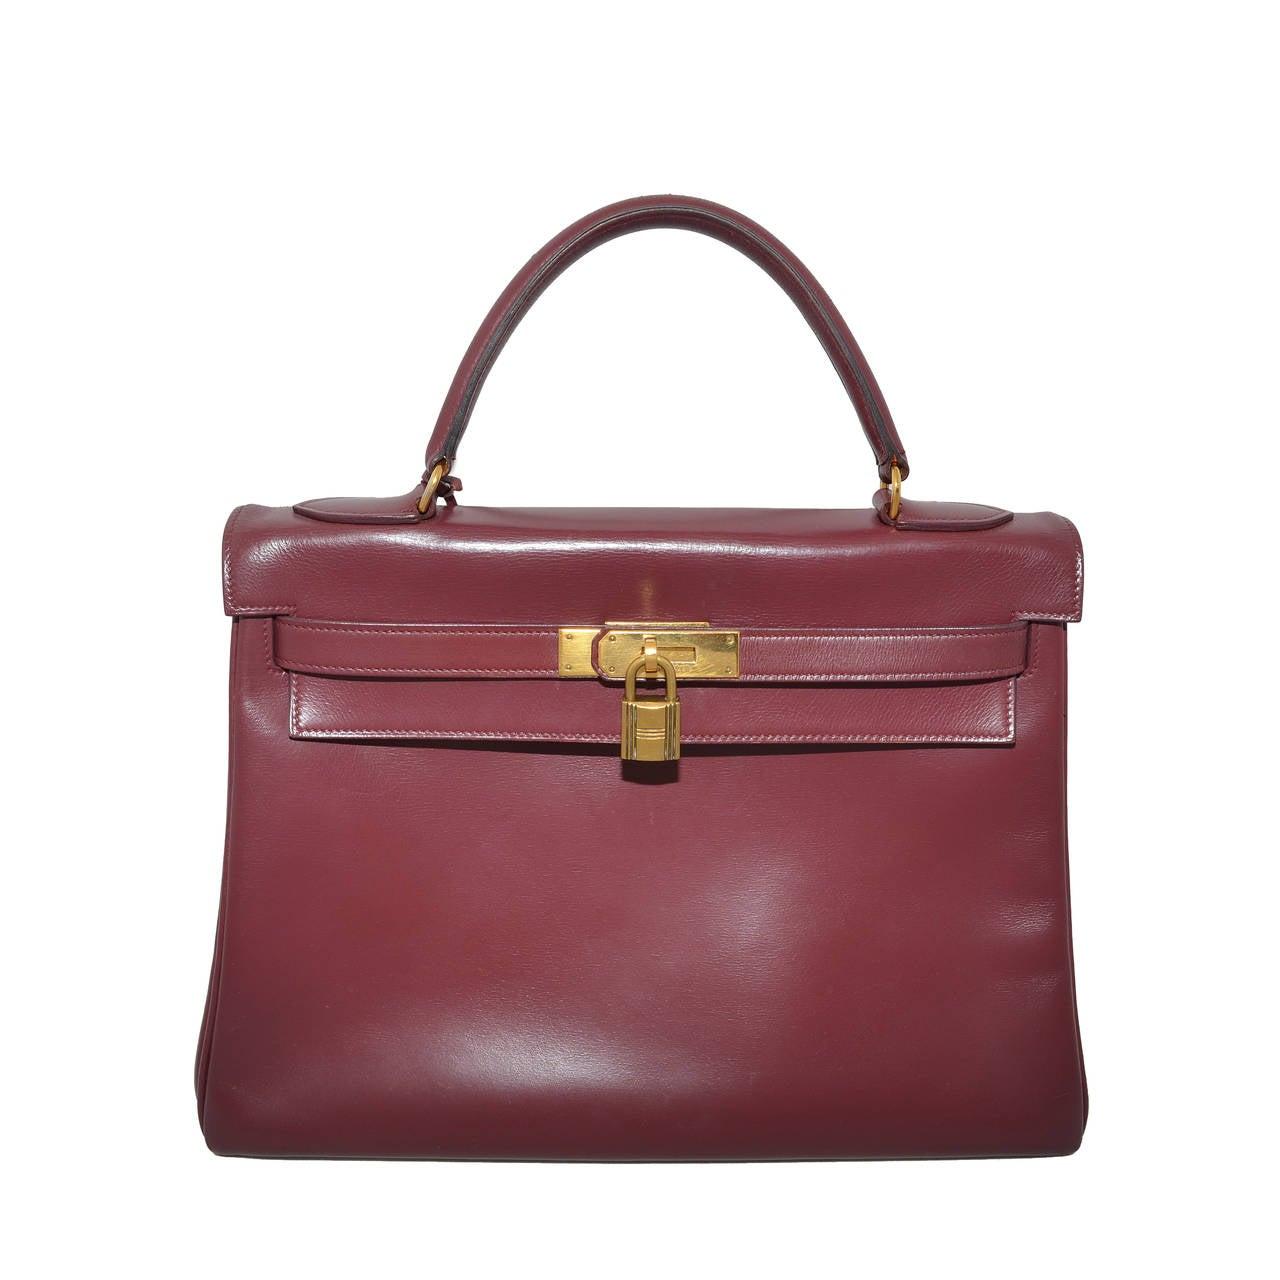 Hermes 1978 32cm Box Calf Kelly Handbag